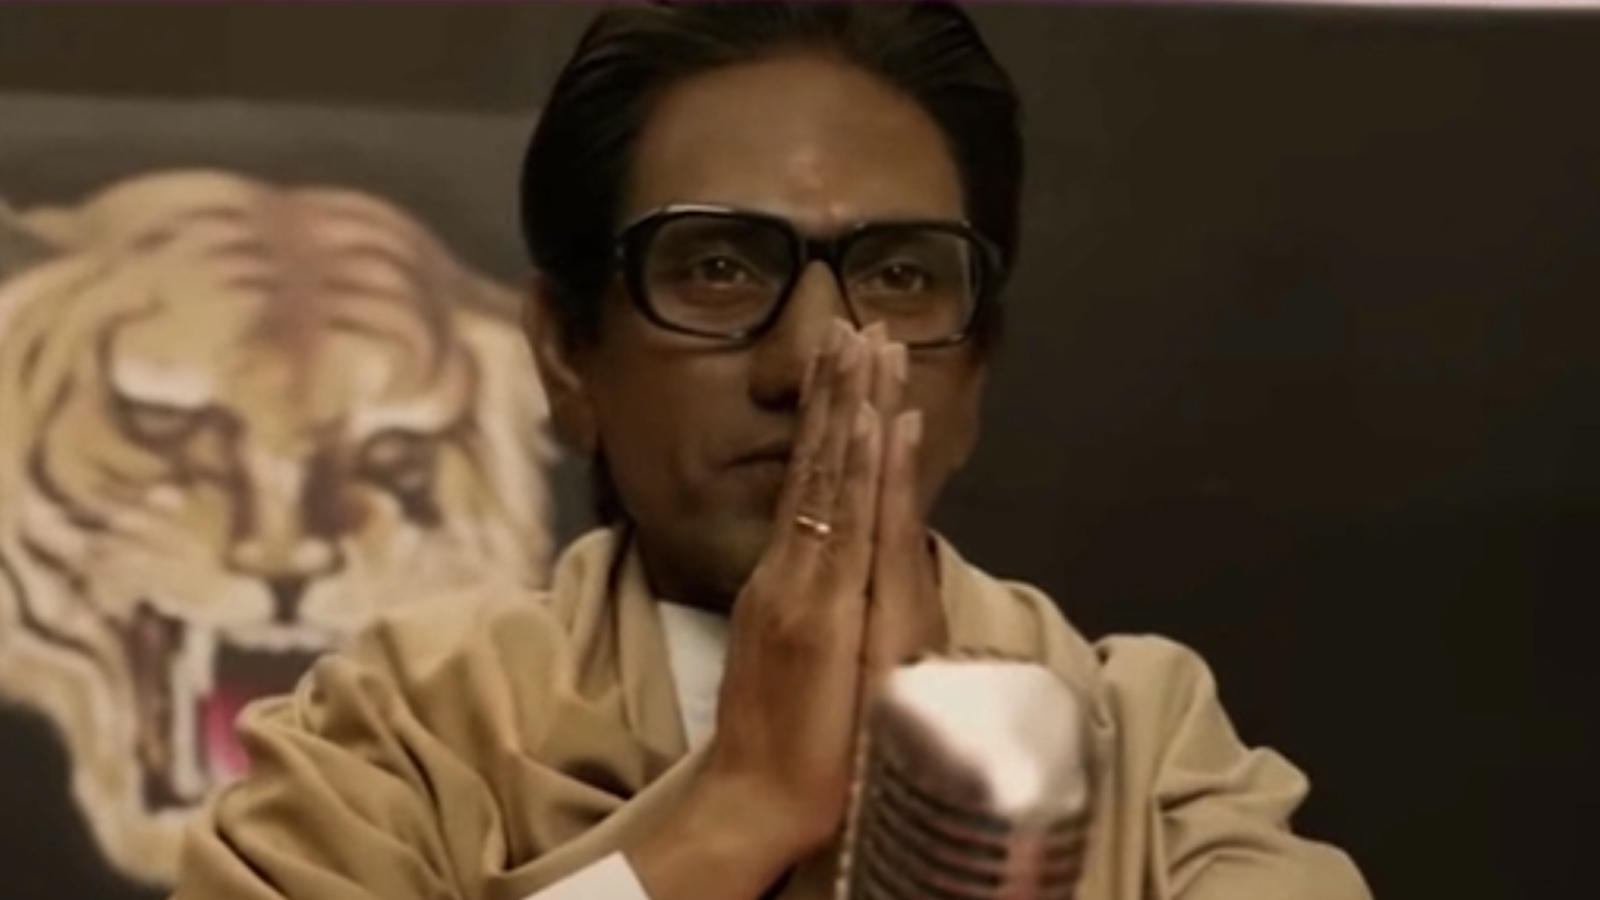 Sequel of Nawazuddin Siddiqui's 'Thackeray' to get delayed till 2021